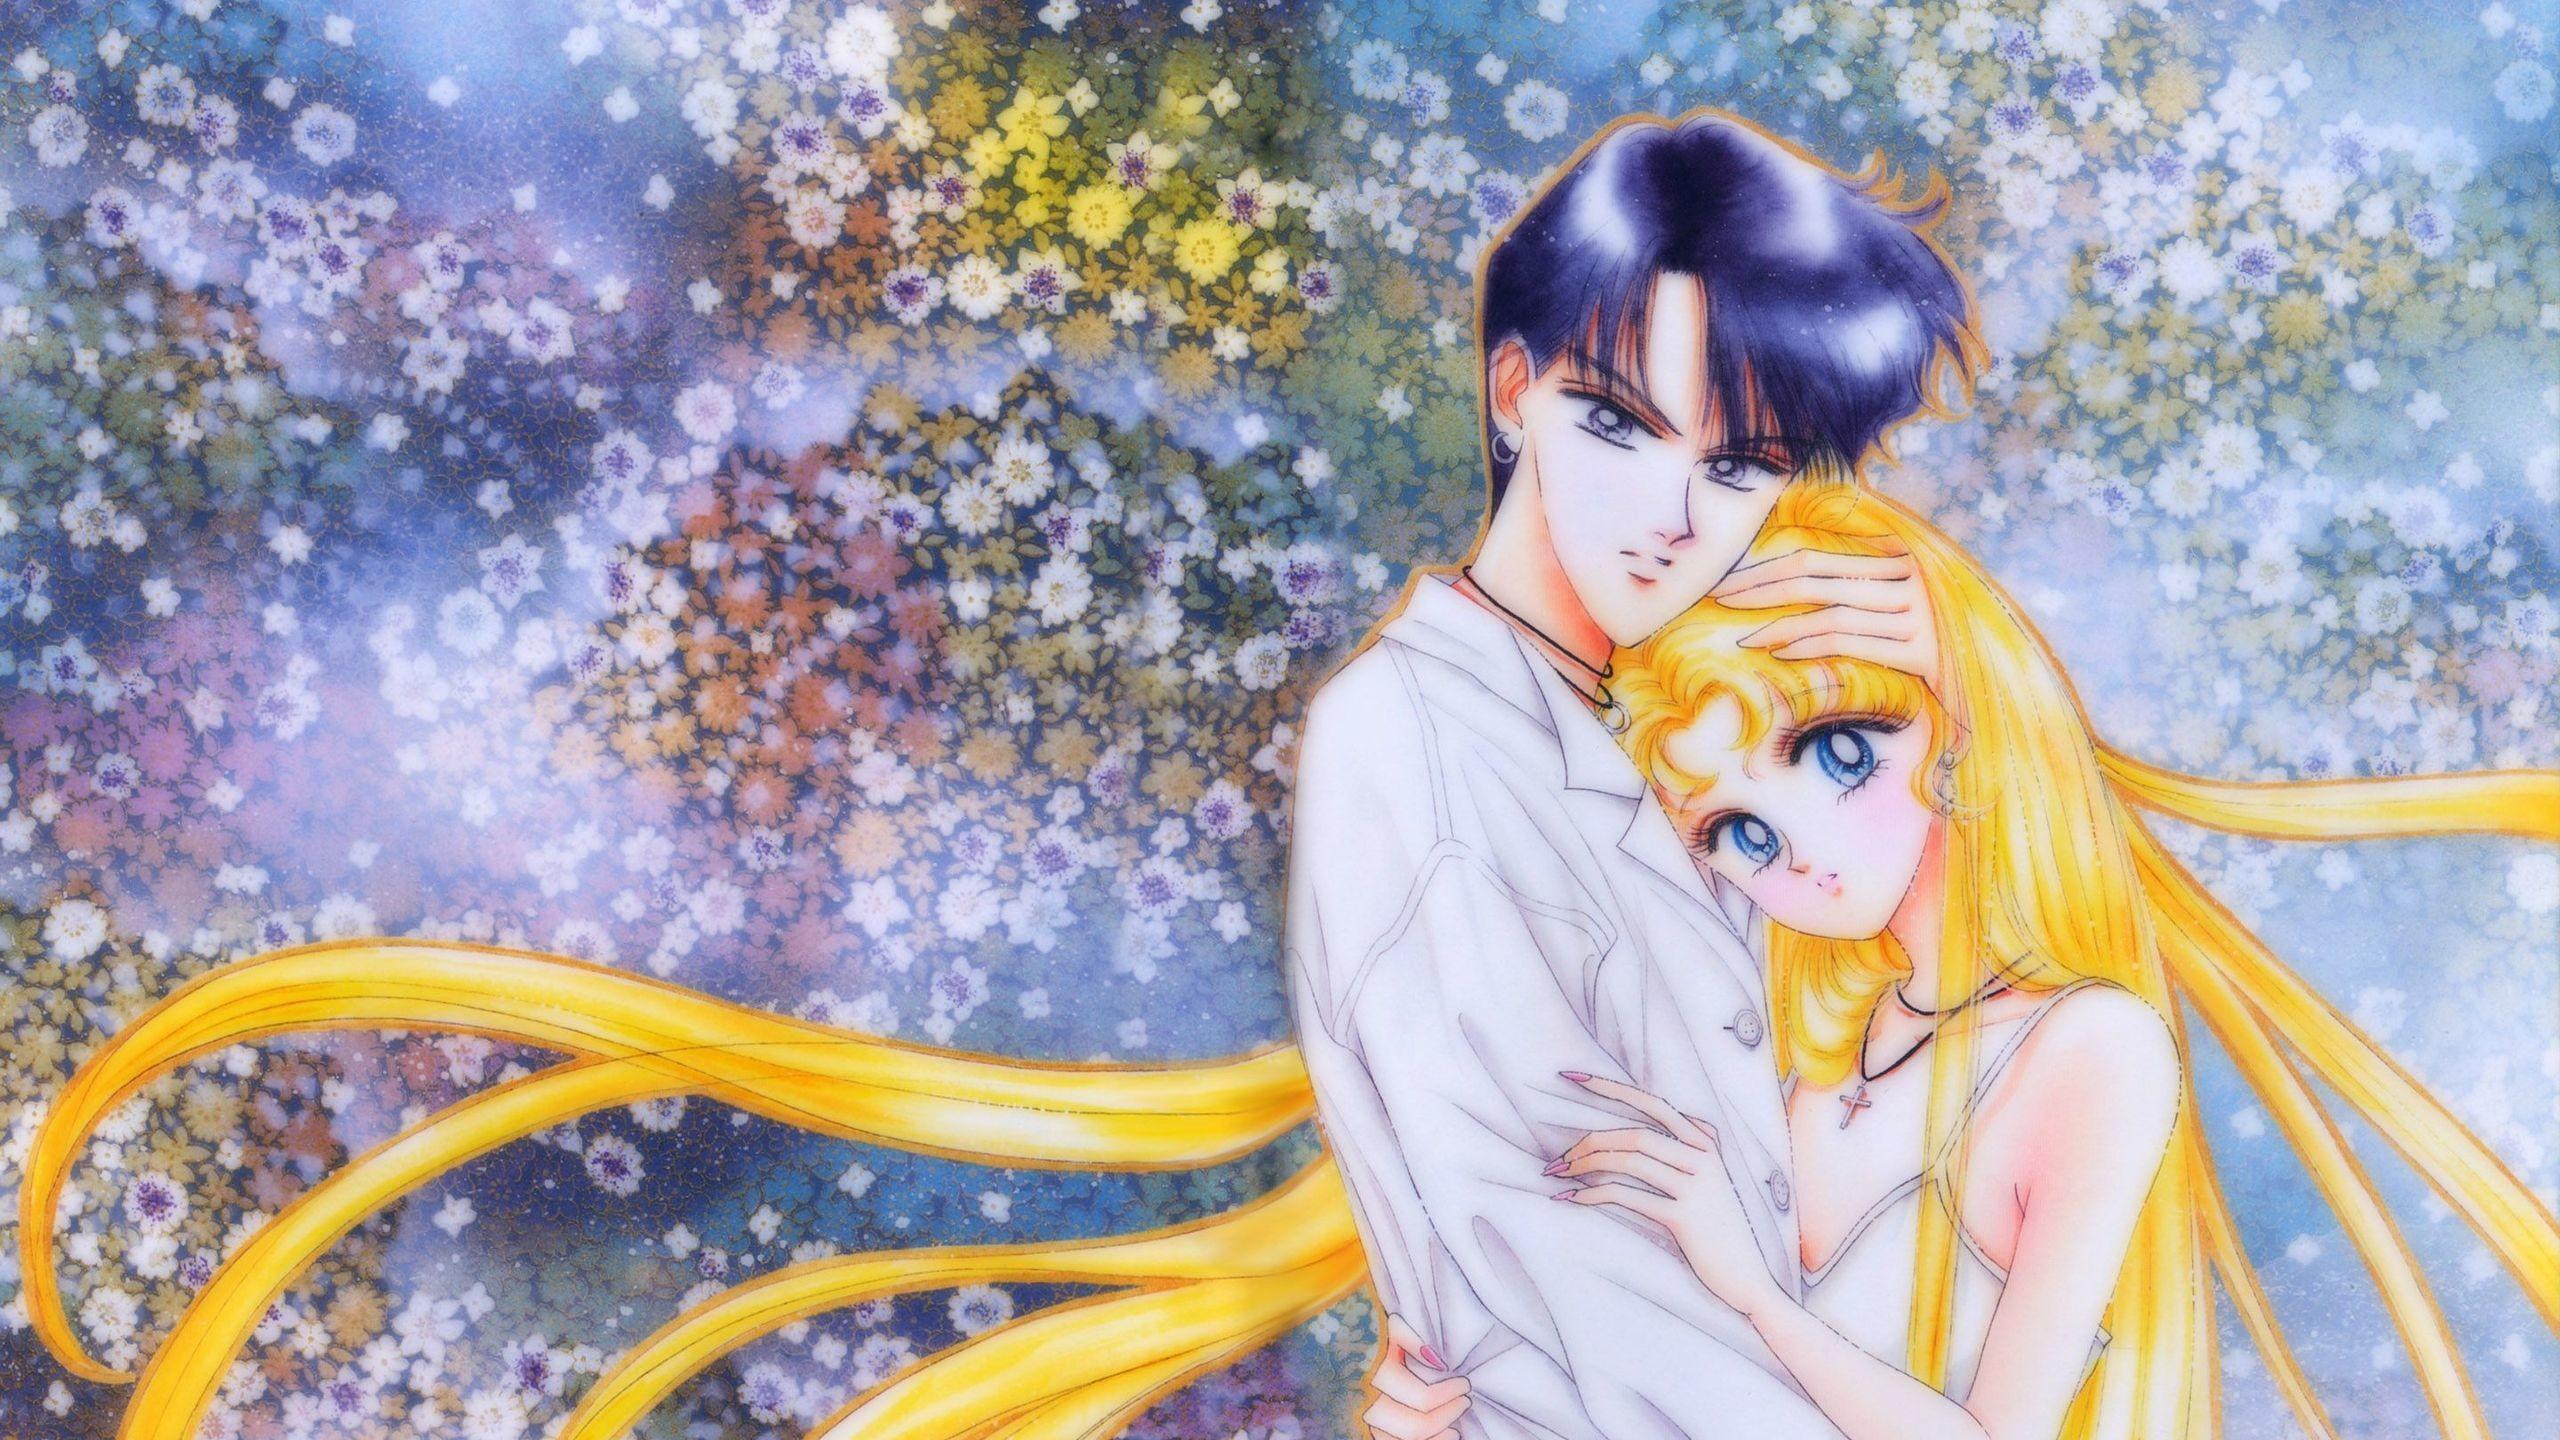 Sailor Moon HD Wallpaper 1920×1080 Sailor Moon HD Wallpaper 1920×1200 Sailor  Moon HD Wallpaper Sailor …